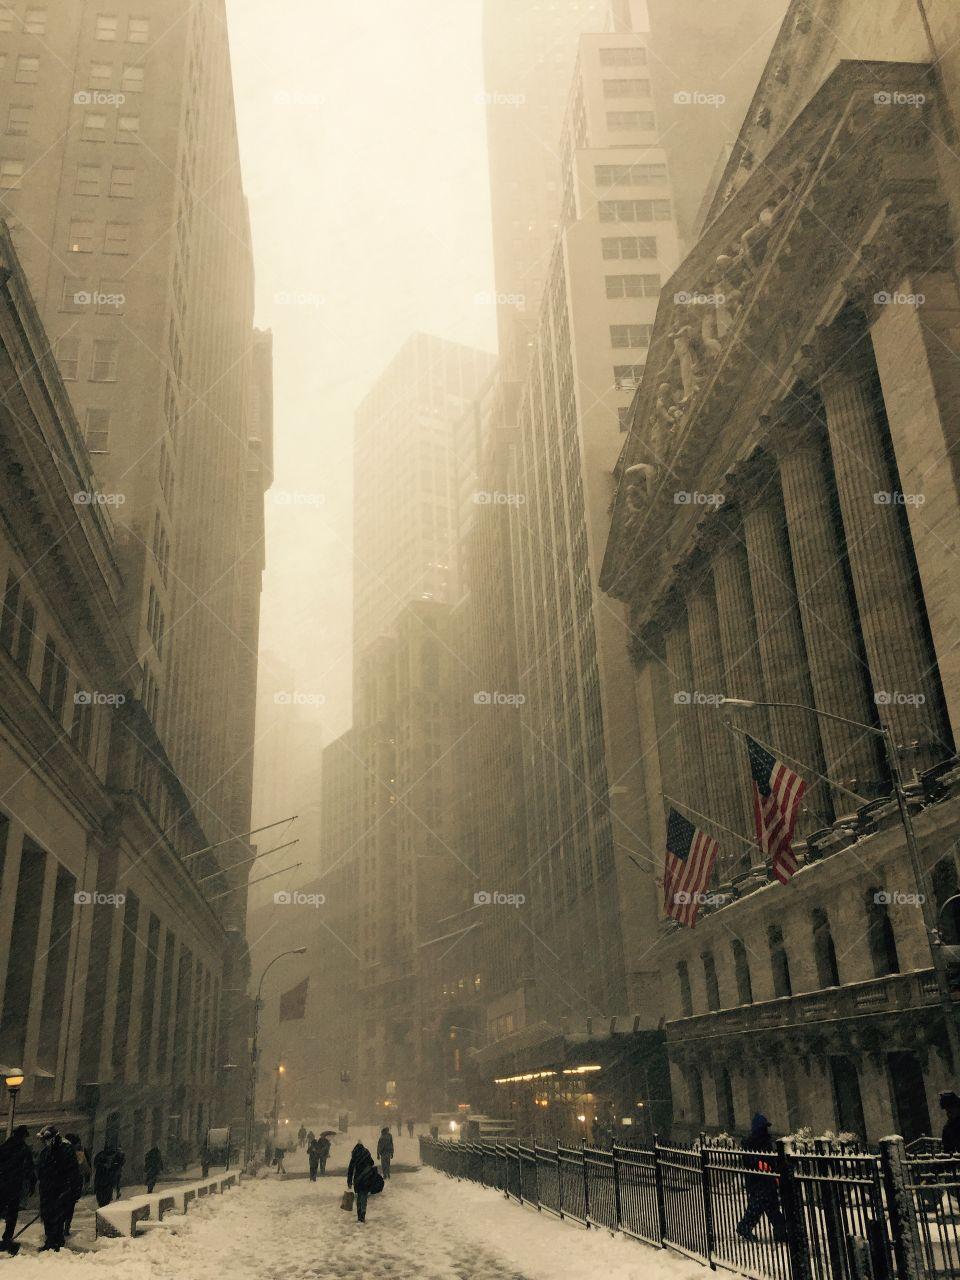 Snowy Wall Street day